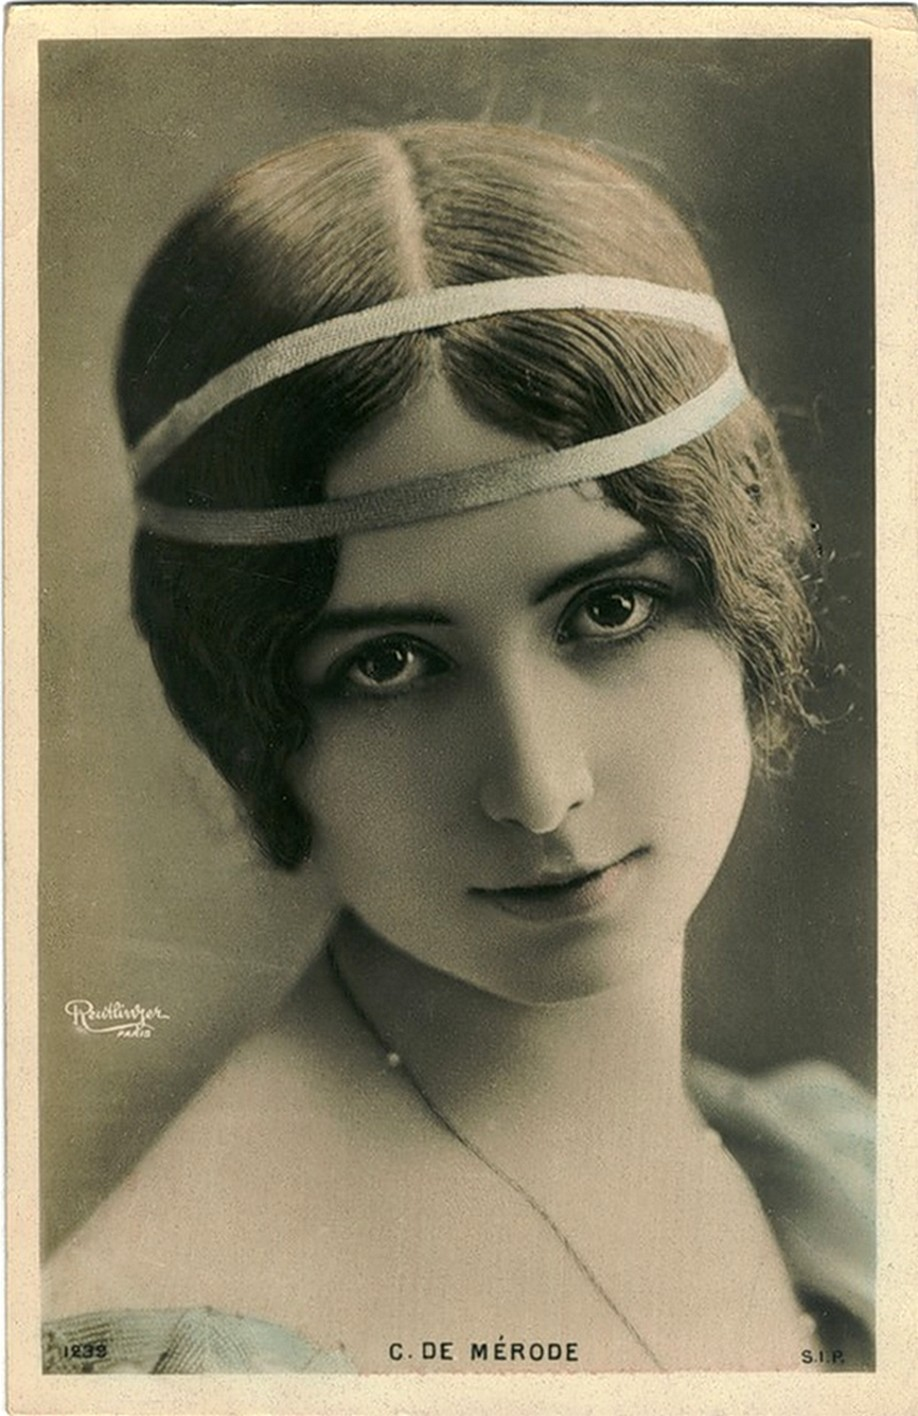 Vintage Woman Cleo De Merode003 By Mementomori Stock On